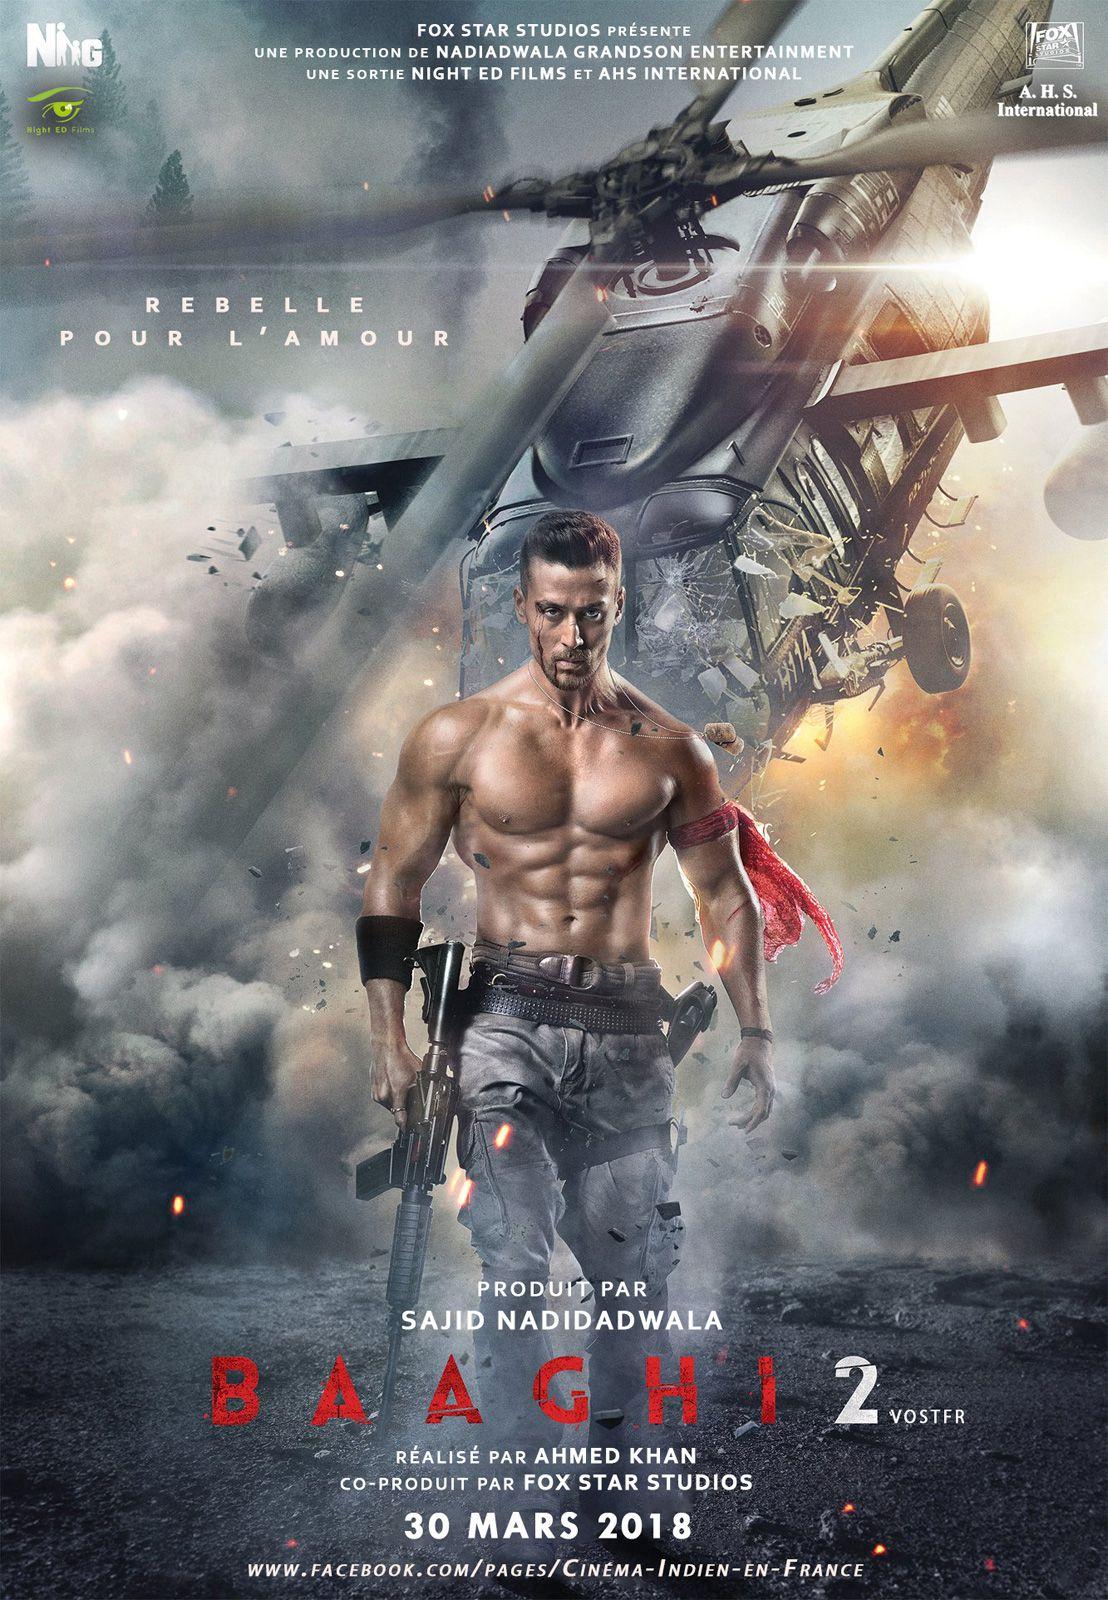 Baaghi 2 : Le Rebelle - Film (2018)